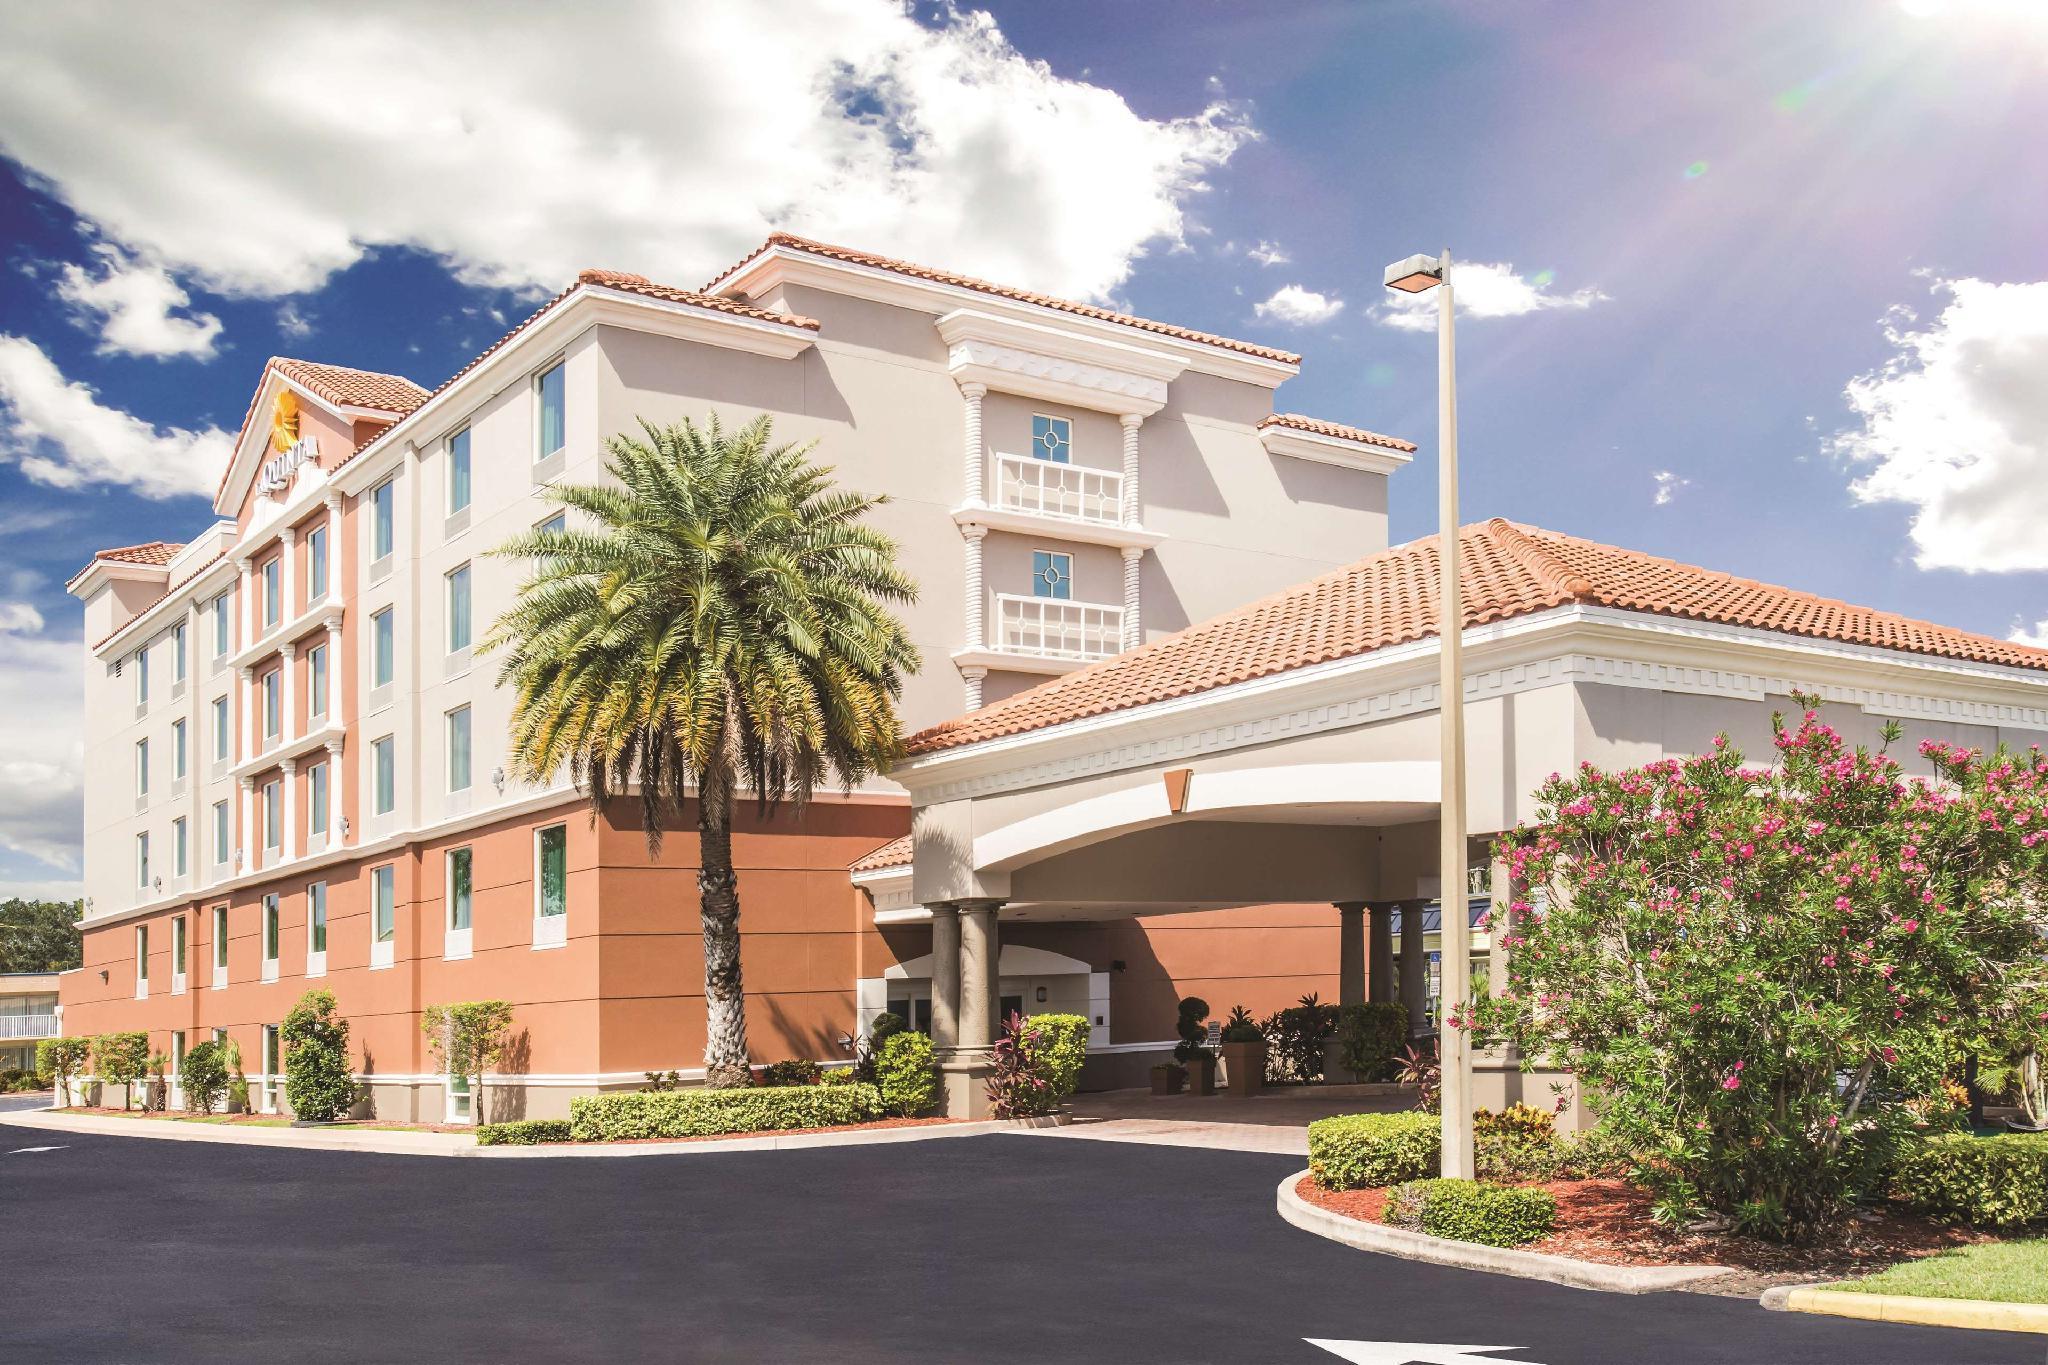 La Quinta Inn And Suites By Wyndham Melbourne   Palm Bay